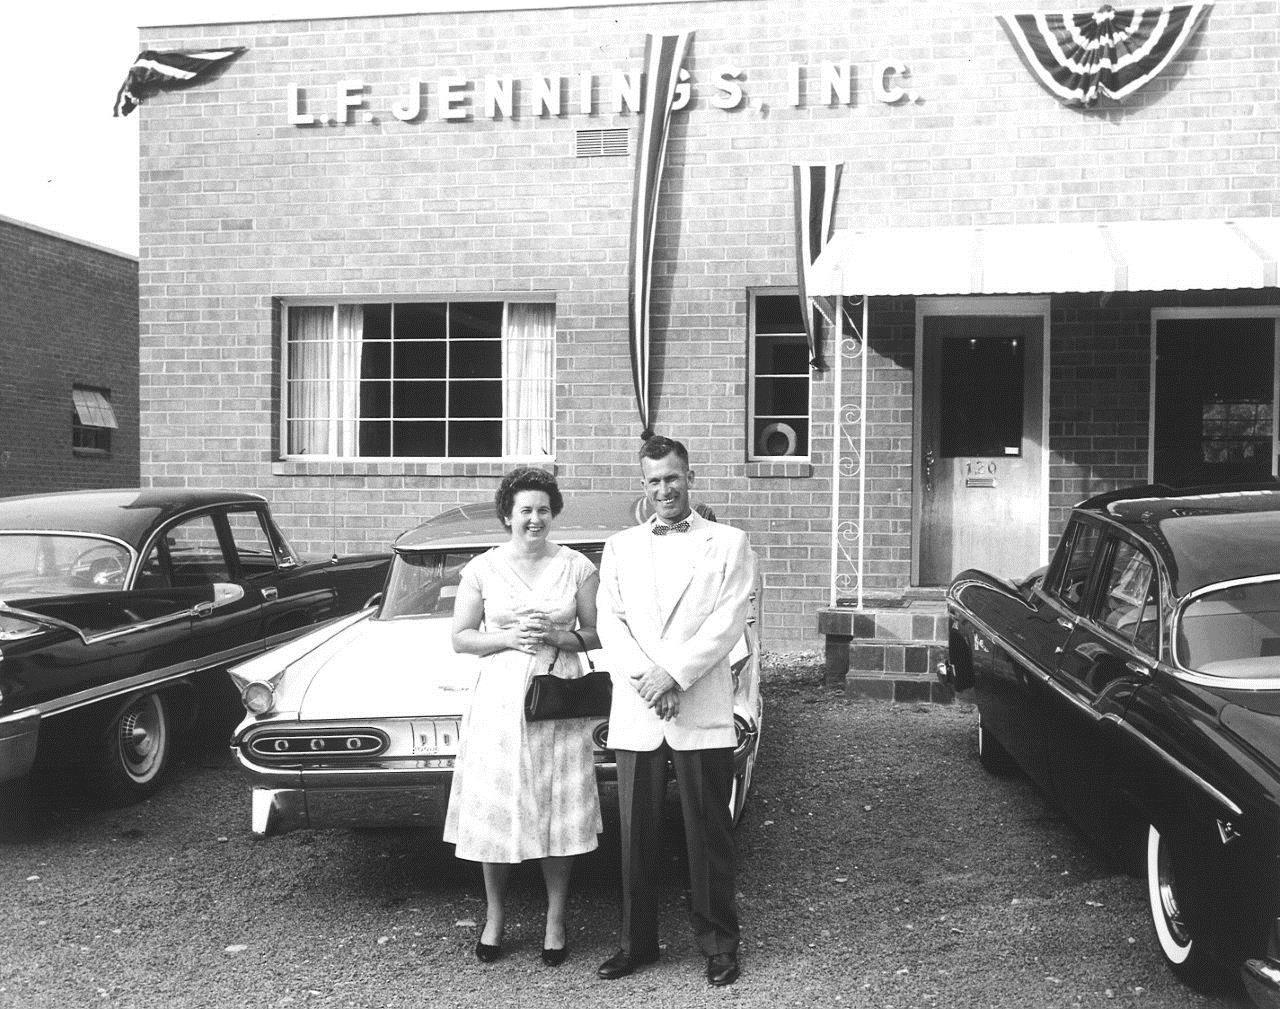 LFJ 60th Picture